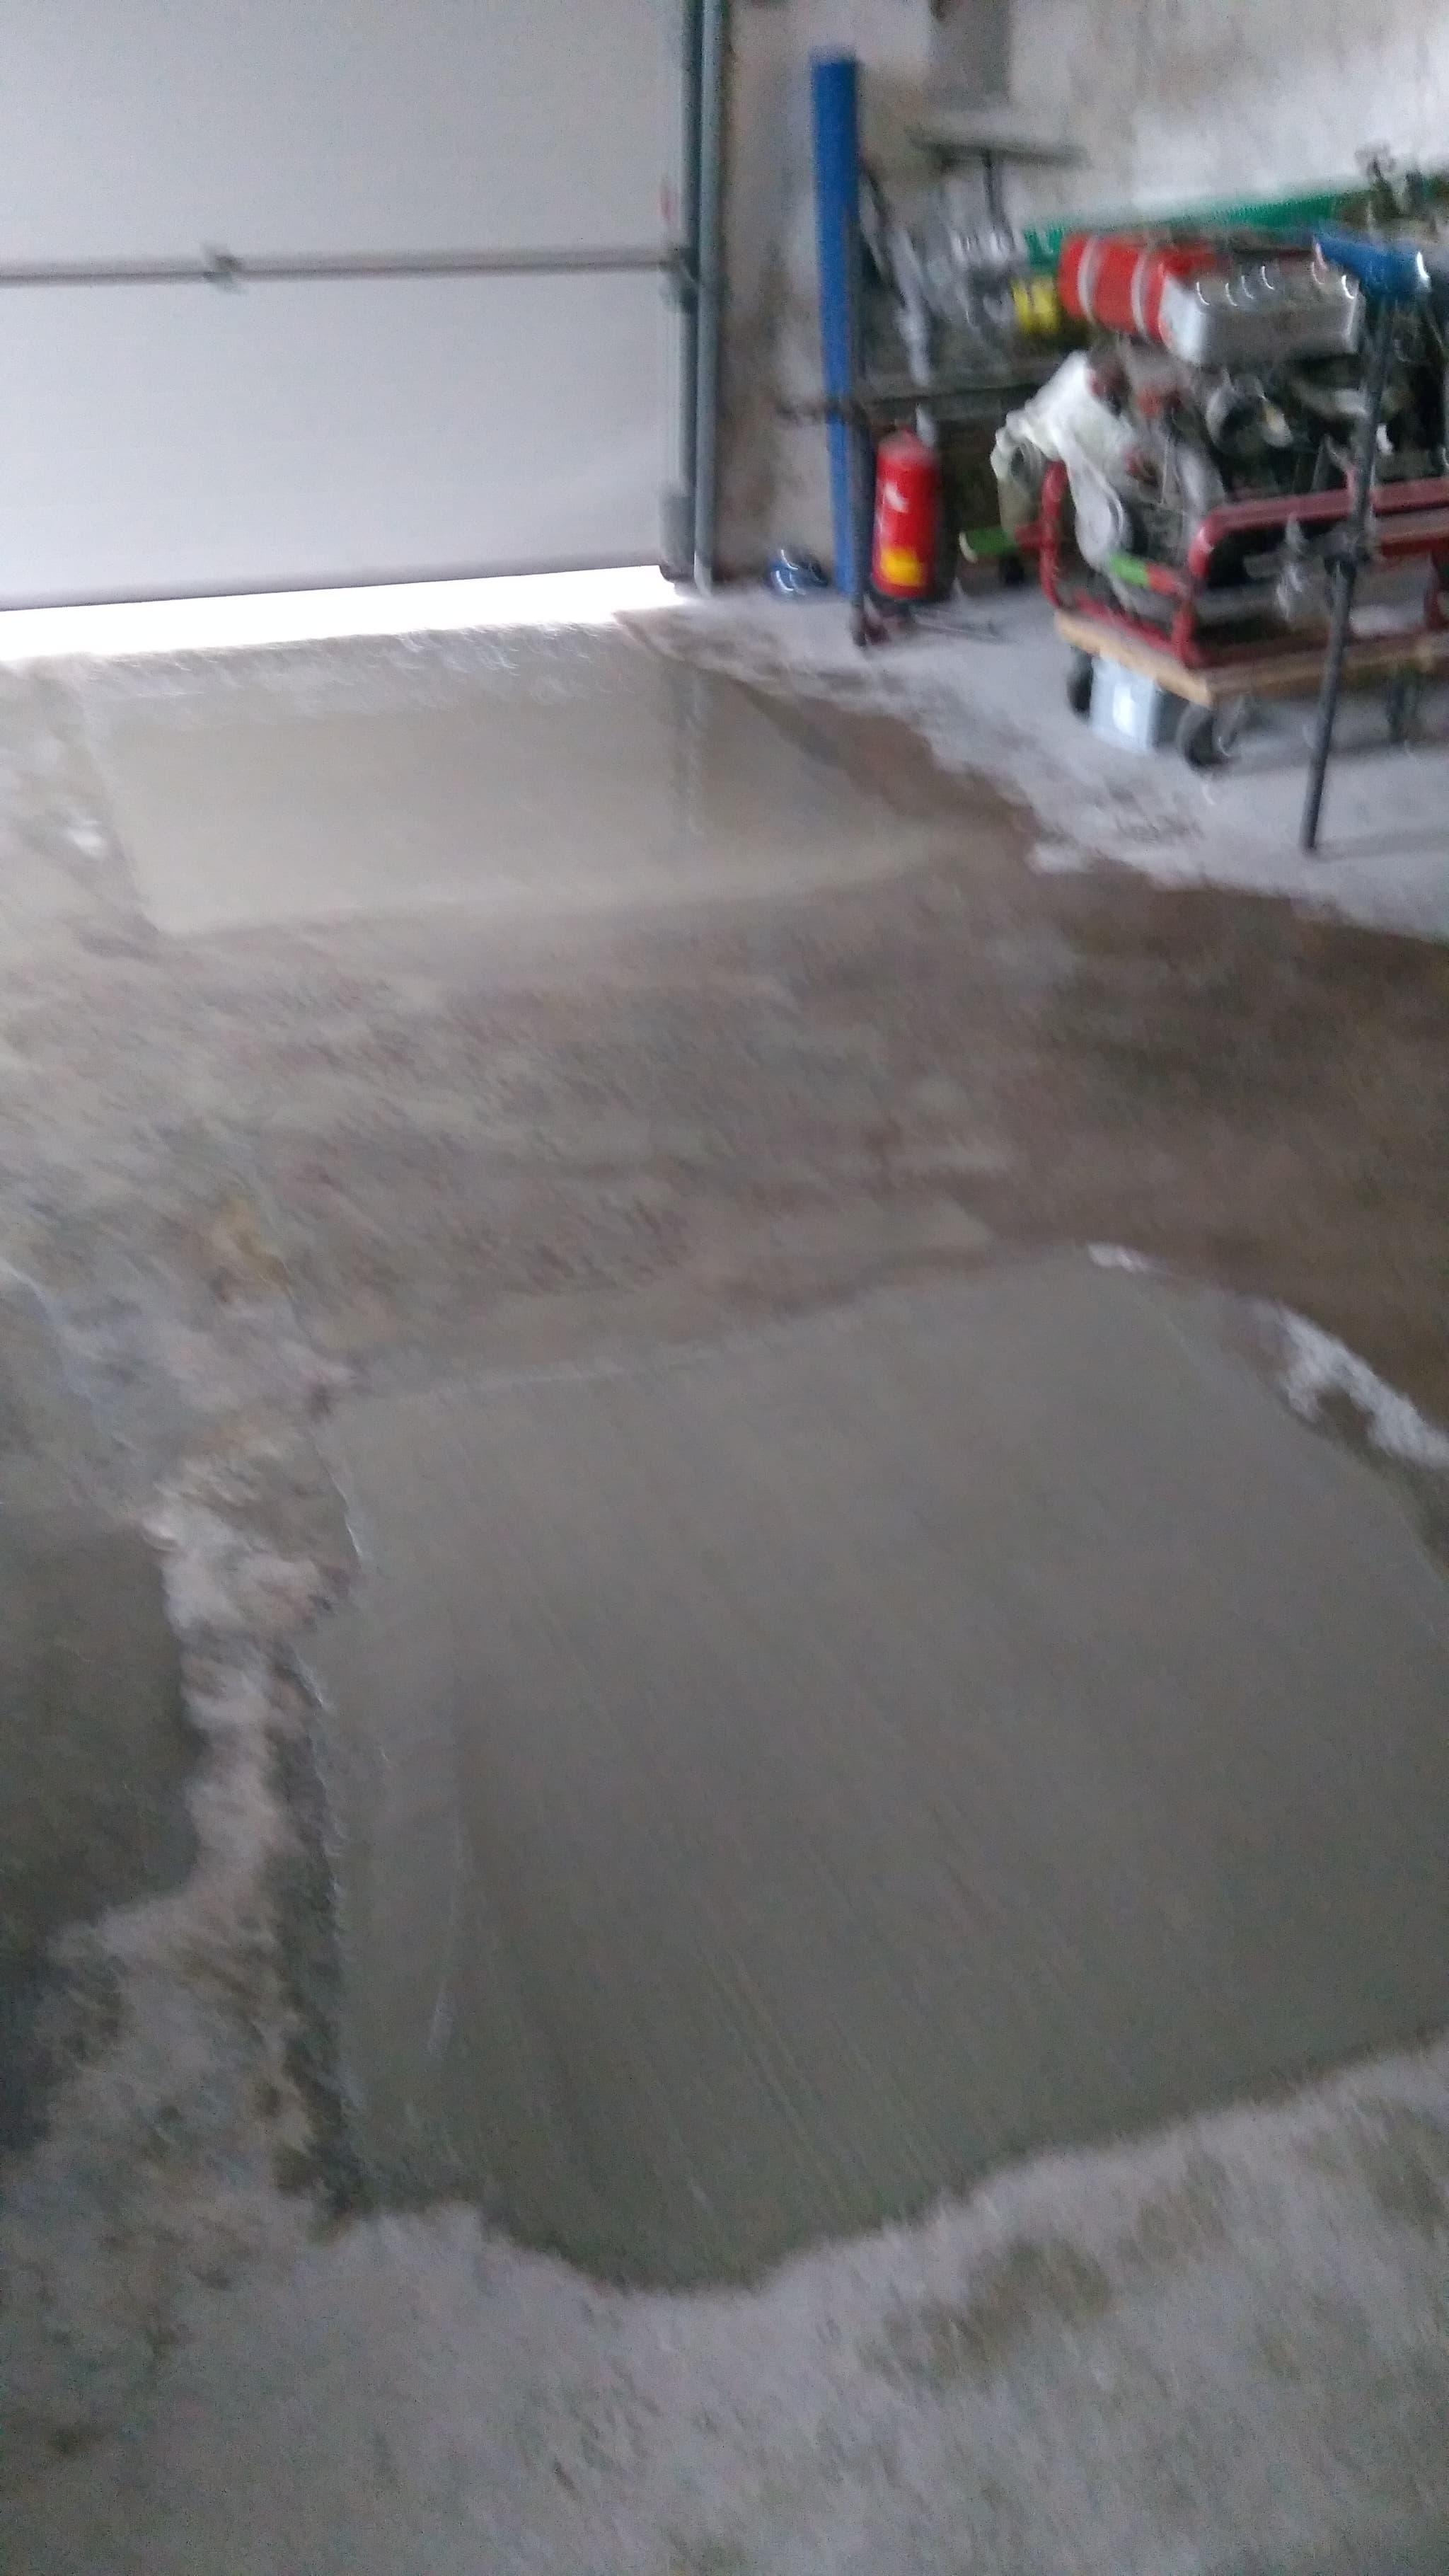 betonovanie podlahy